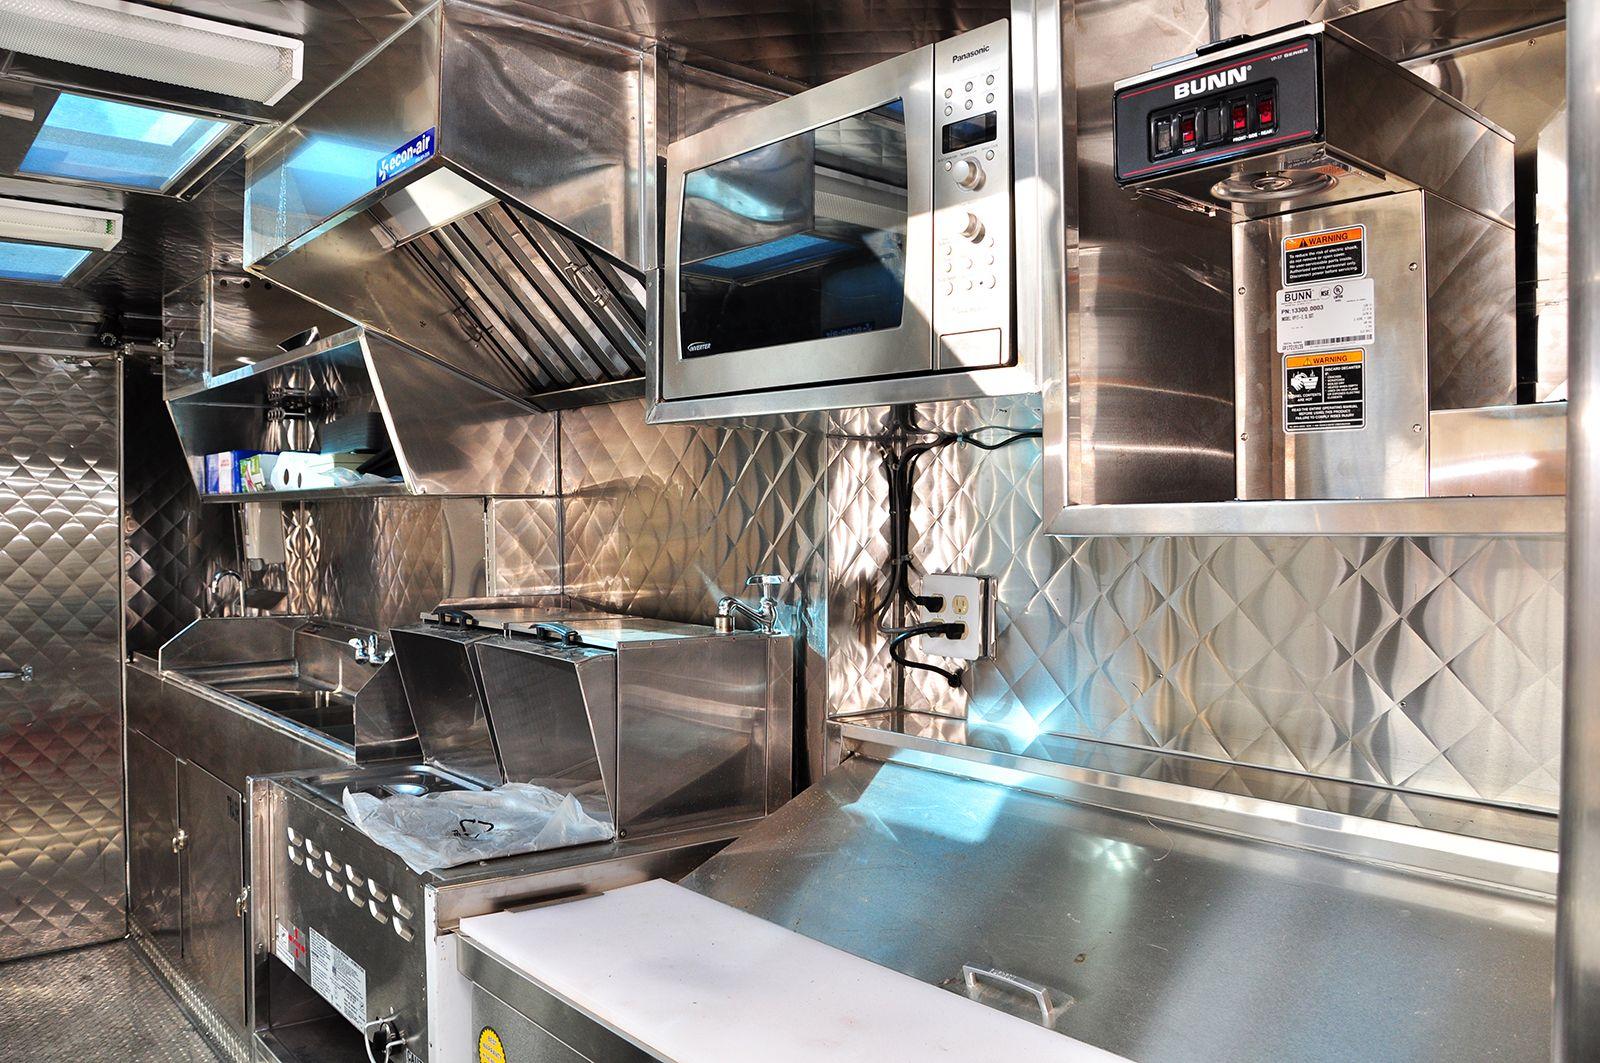 Inside A Food Truck